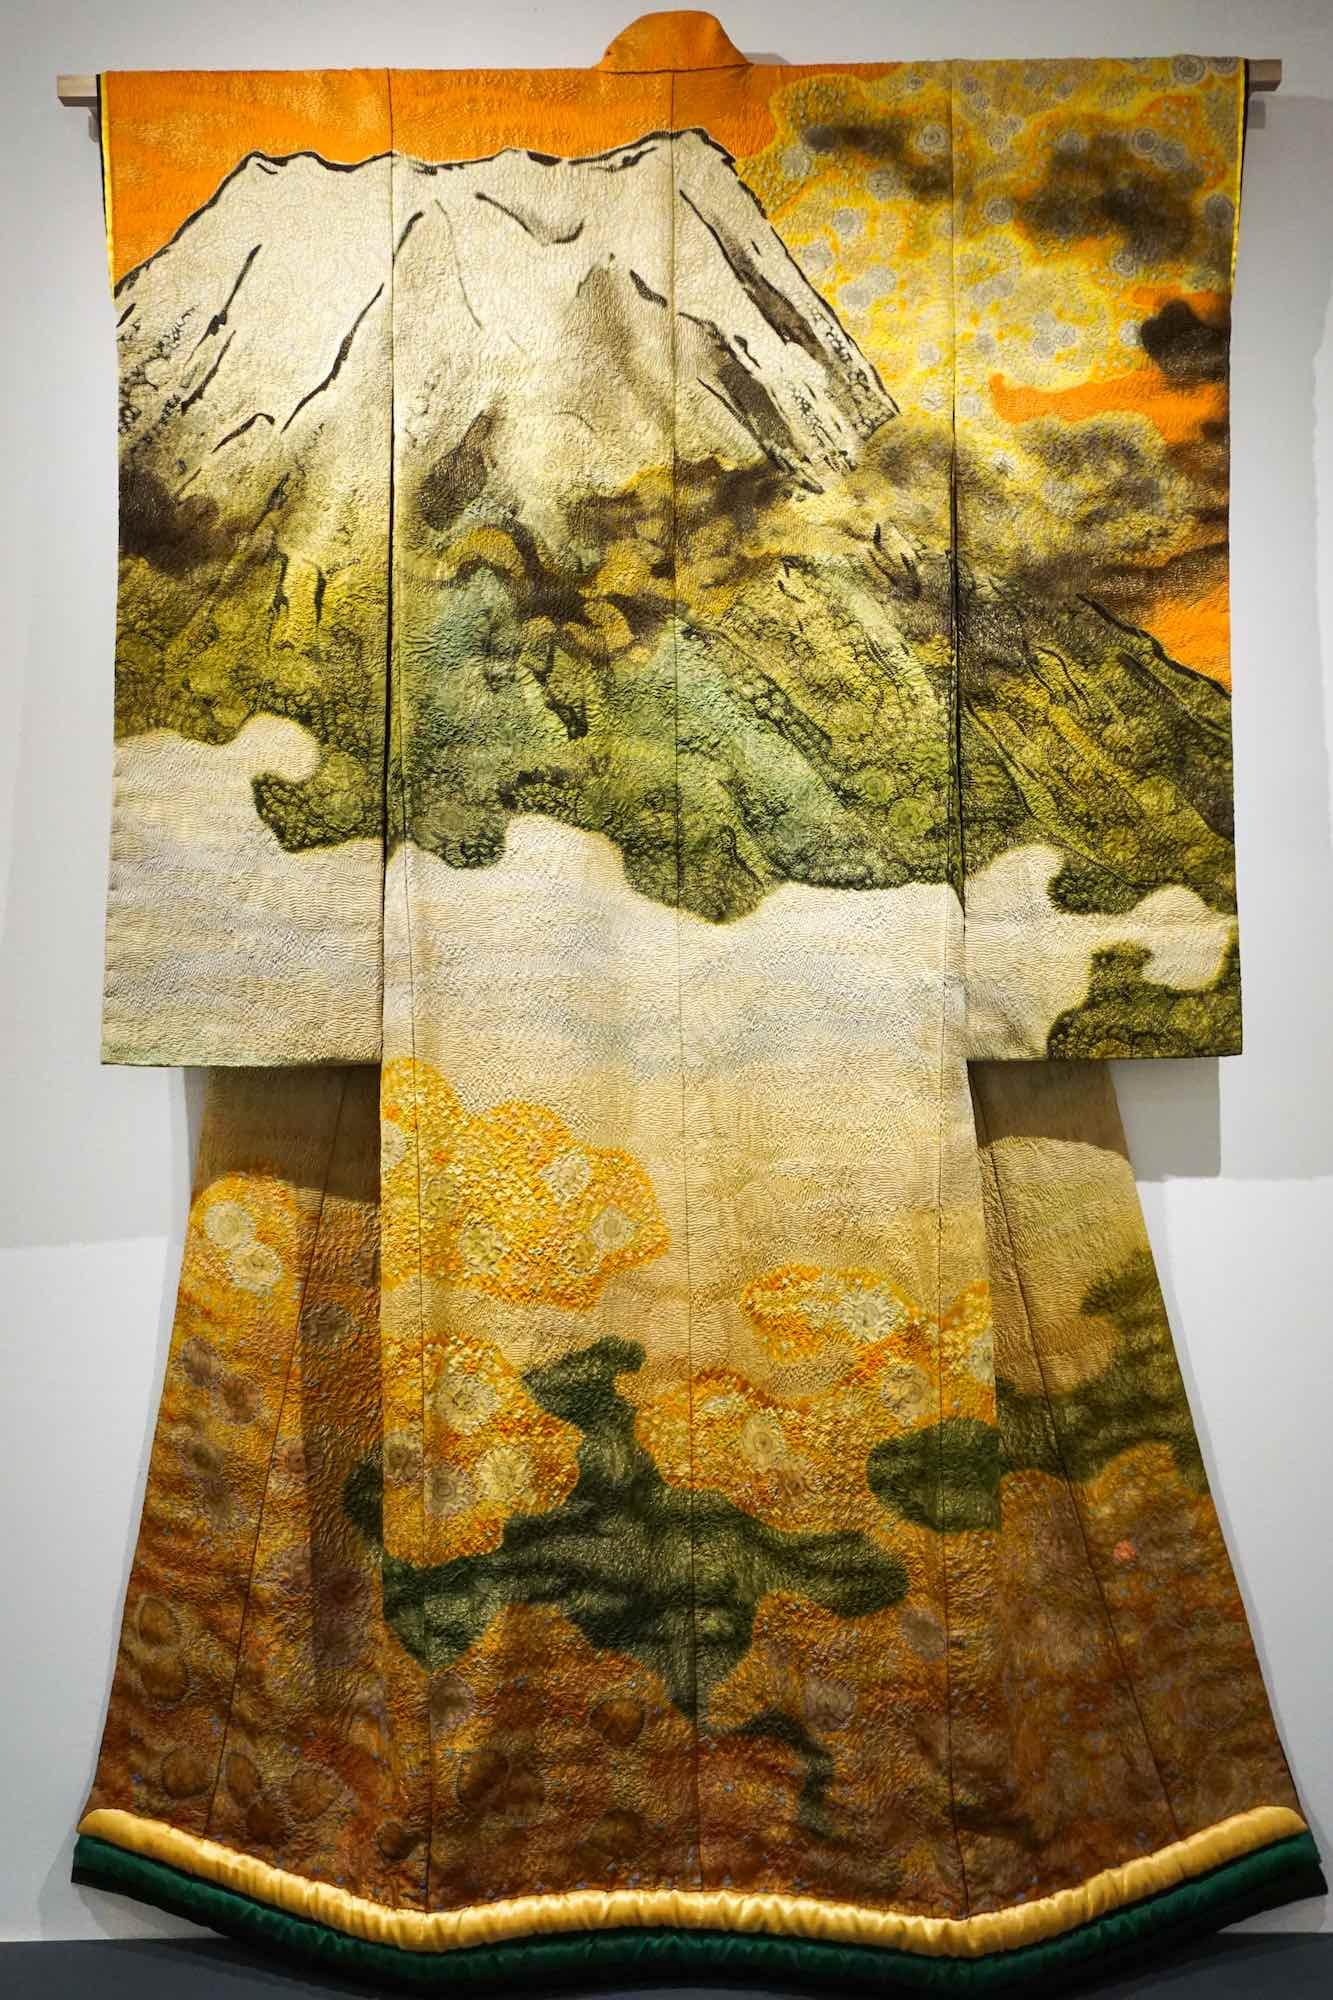 The Itchiku Kubota Kimono Exhibit At The Textile Museum of Canada in ...